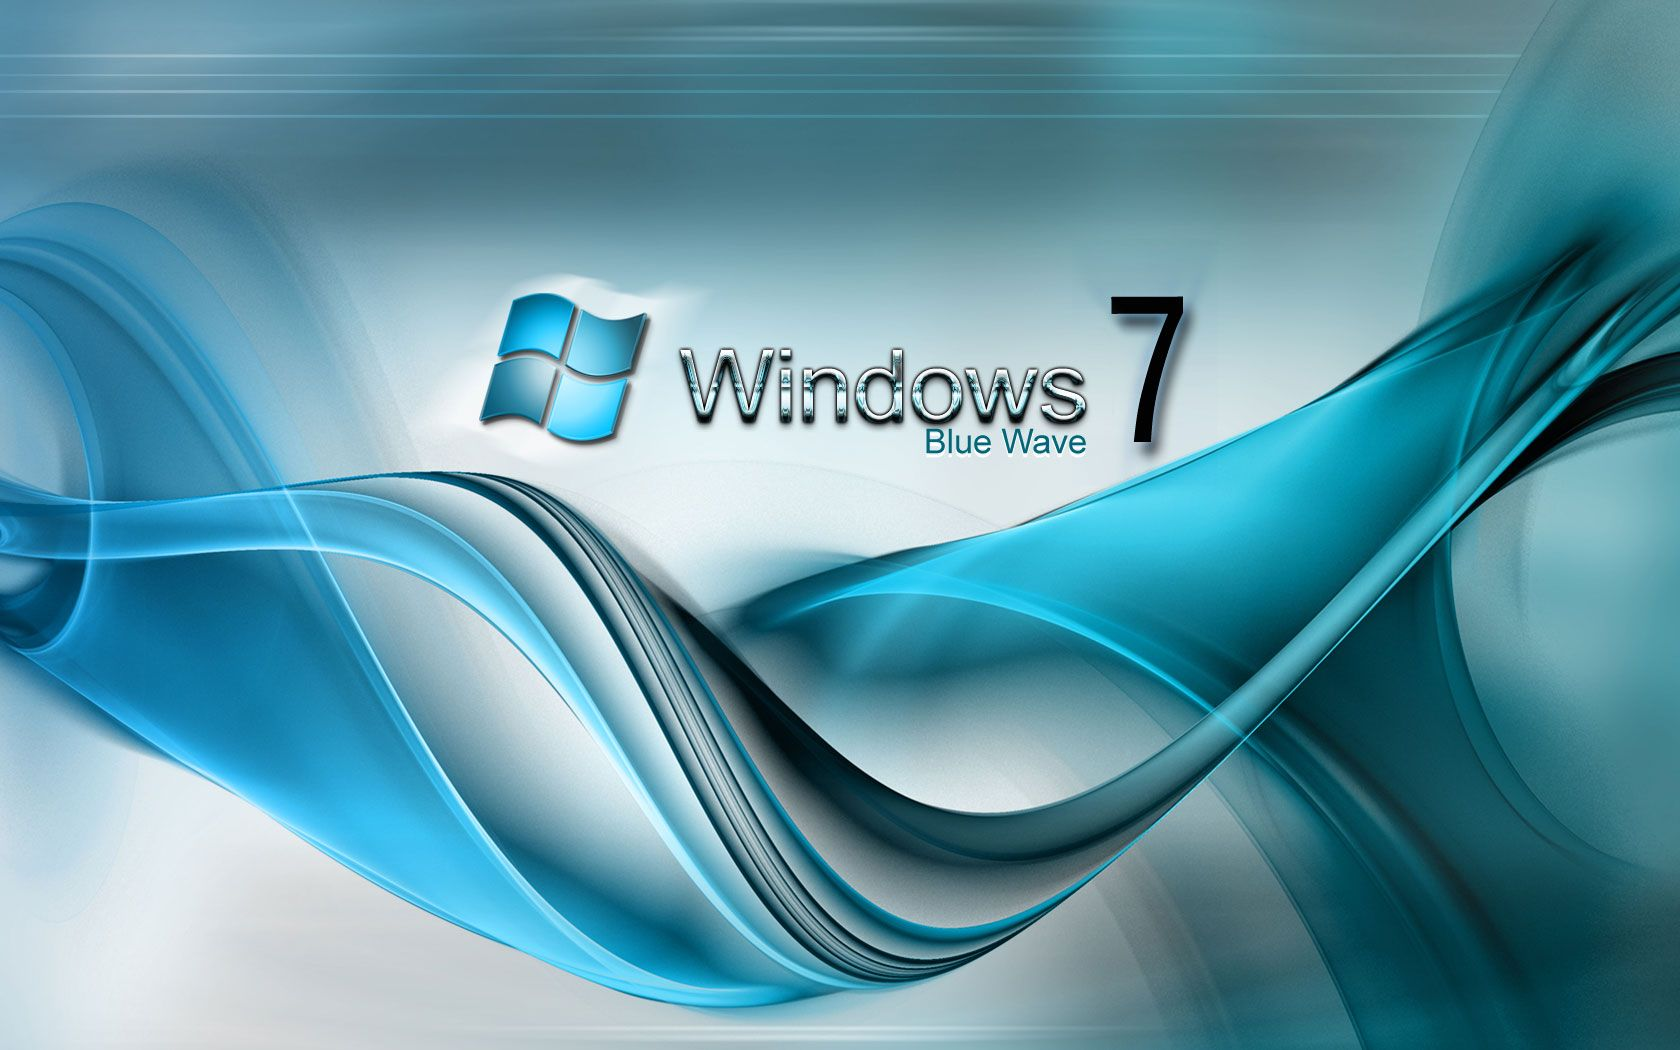 3d Wallpapers For Pc Windows 7 Download   CZARNY MAZAK 1680x1050